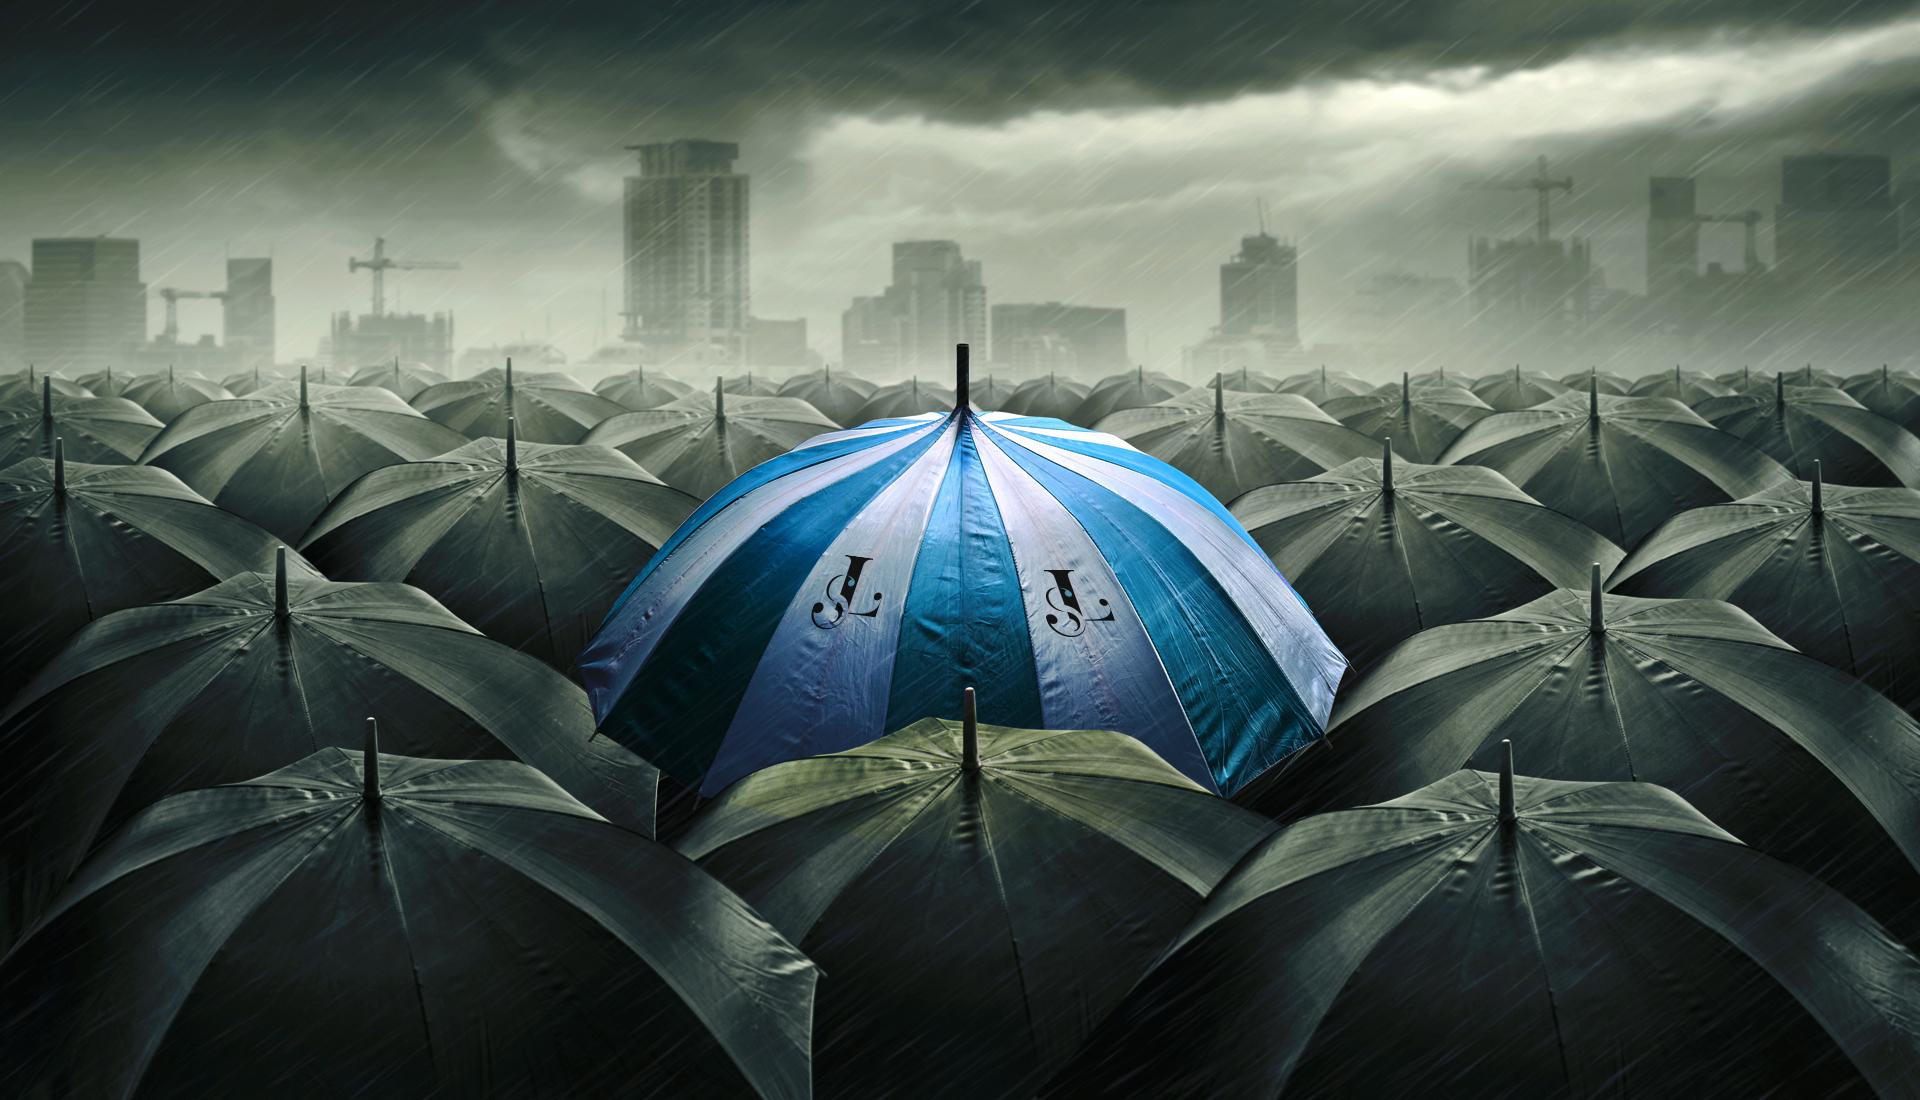 slider 1920x1100 ombrello 1